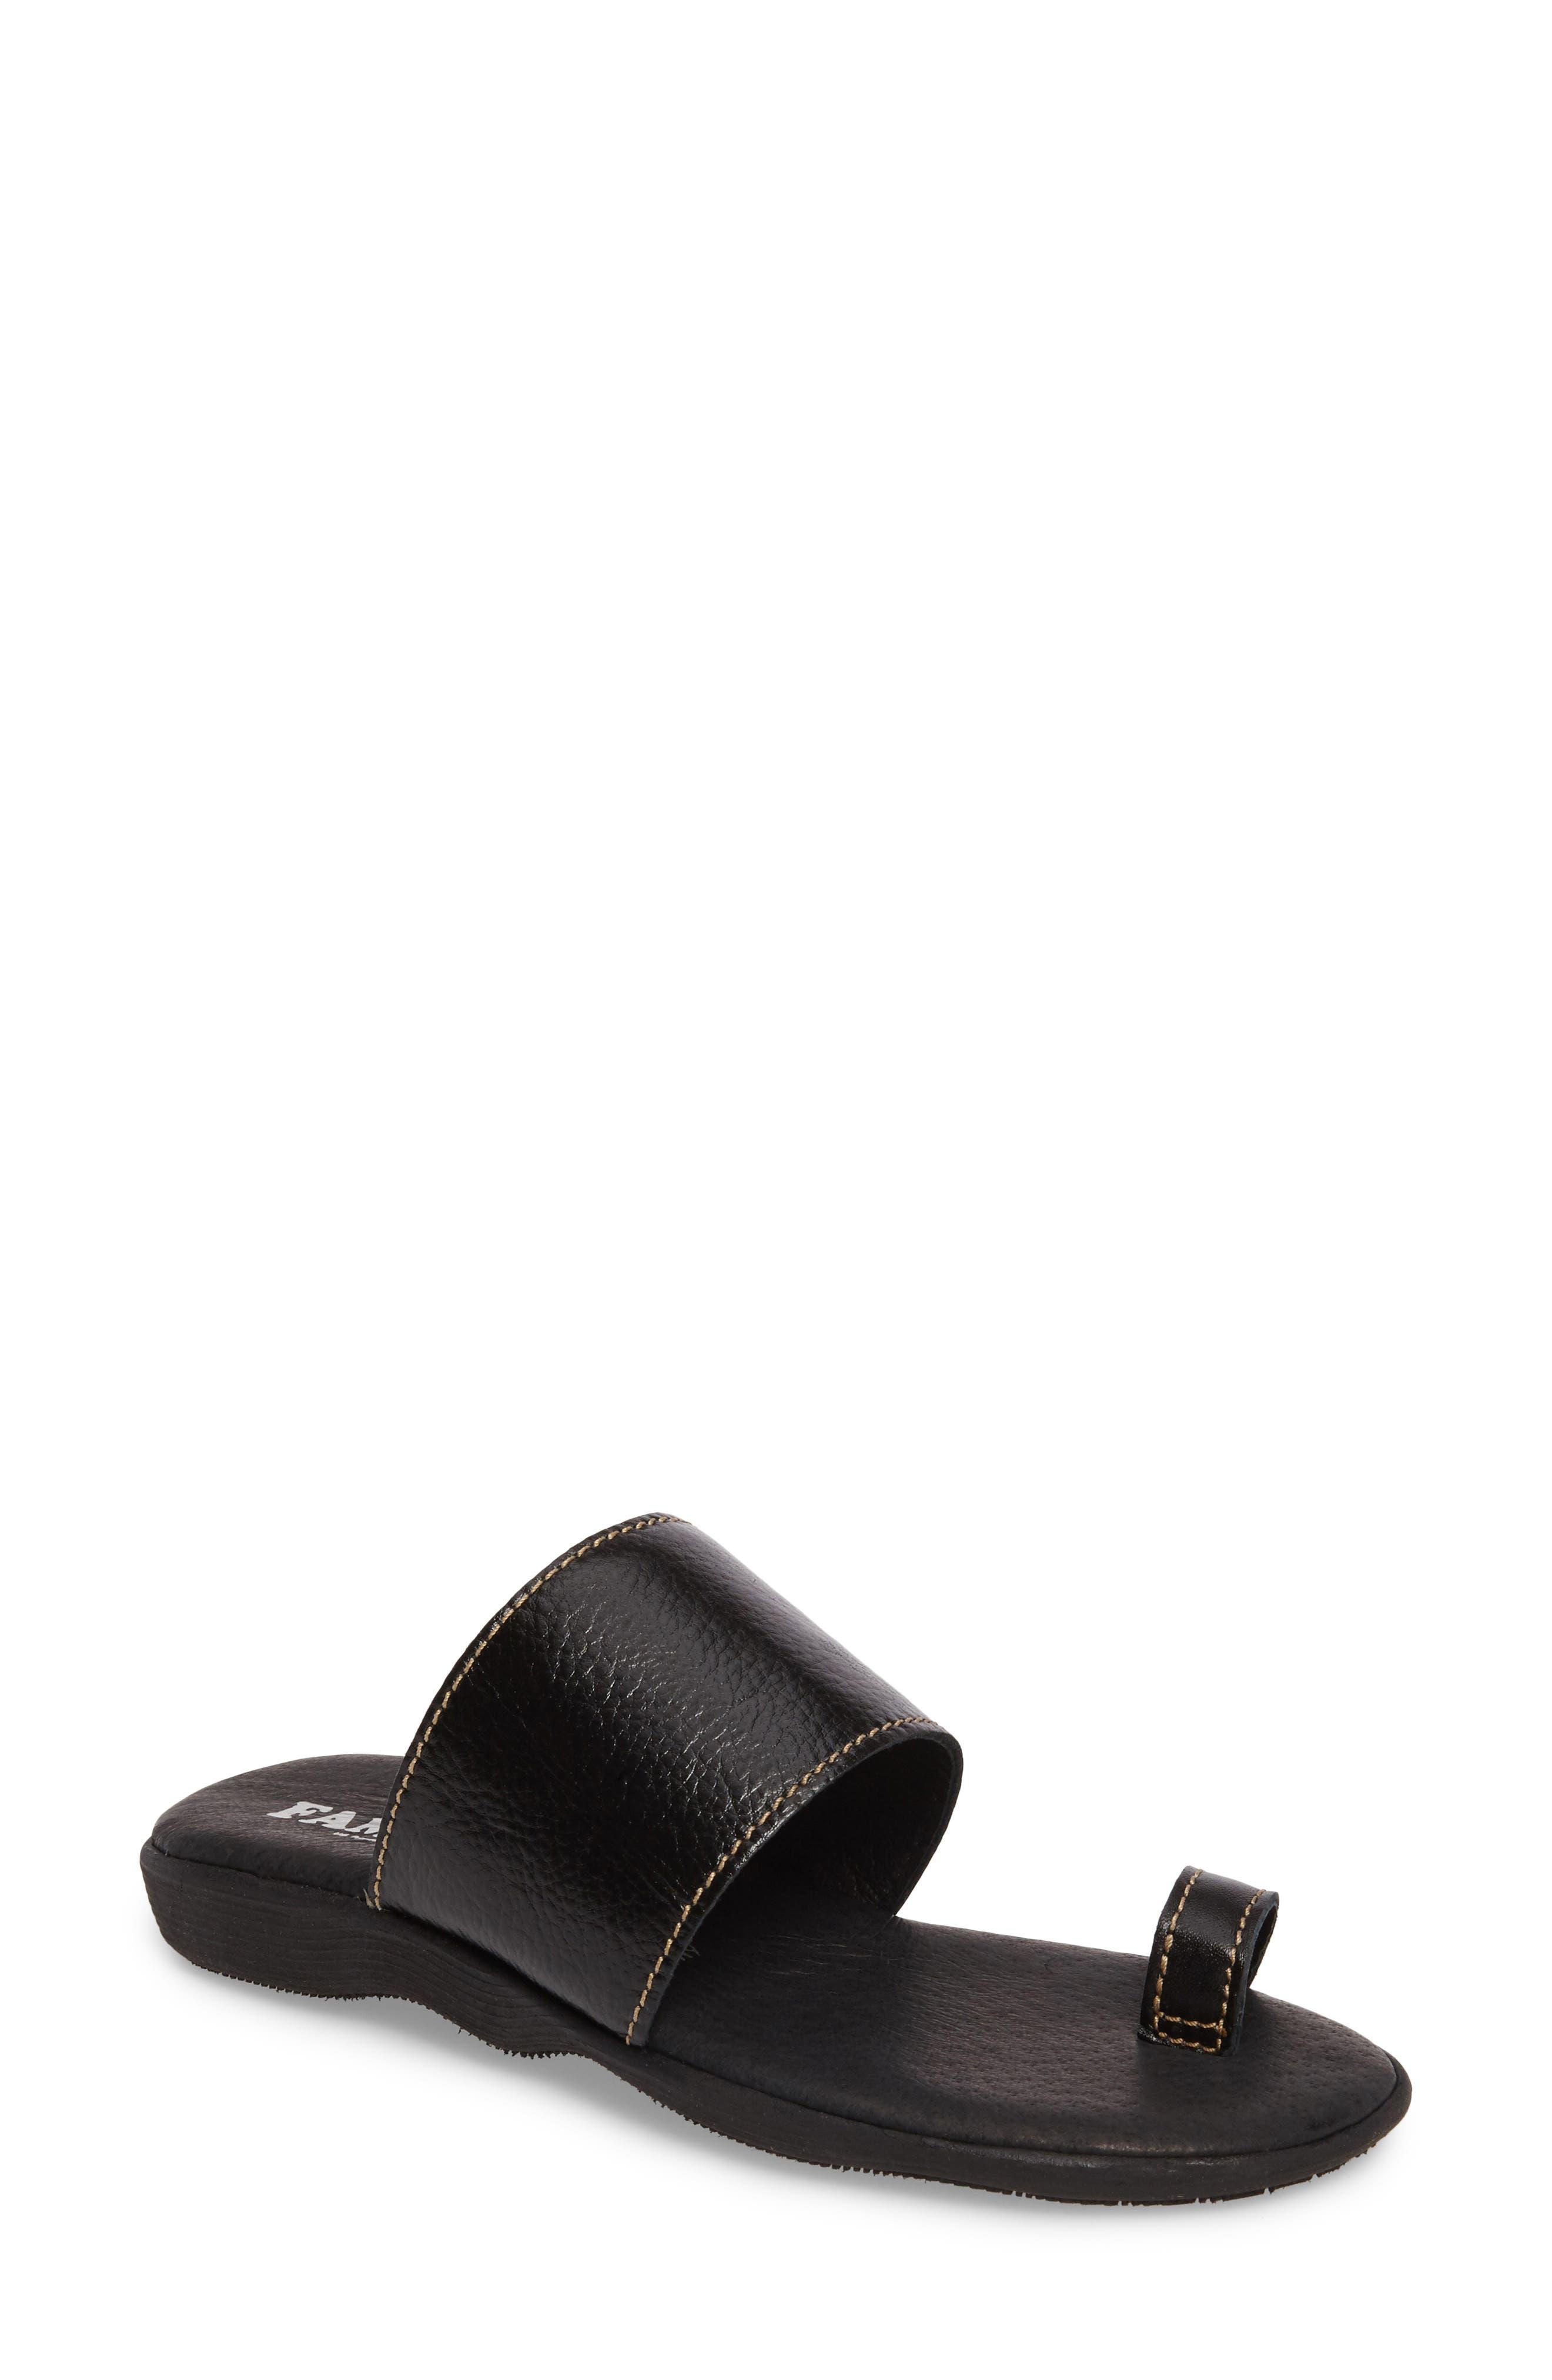 Band & Deliver Toe Loop Slide Sandal,                             Main thumbnail 1, color,                             Coal Leather